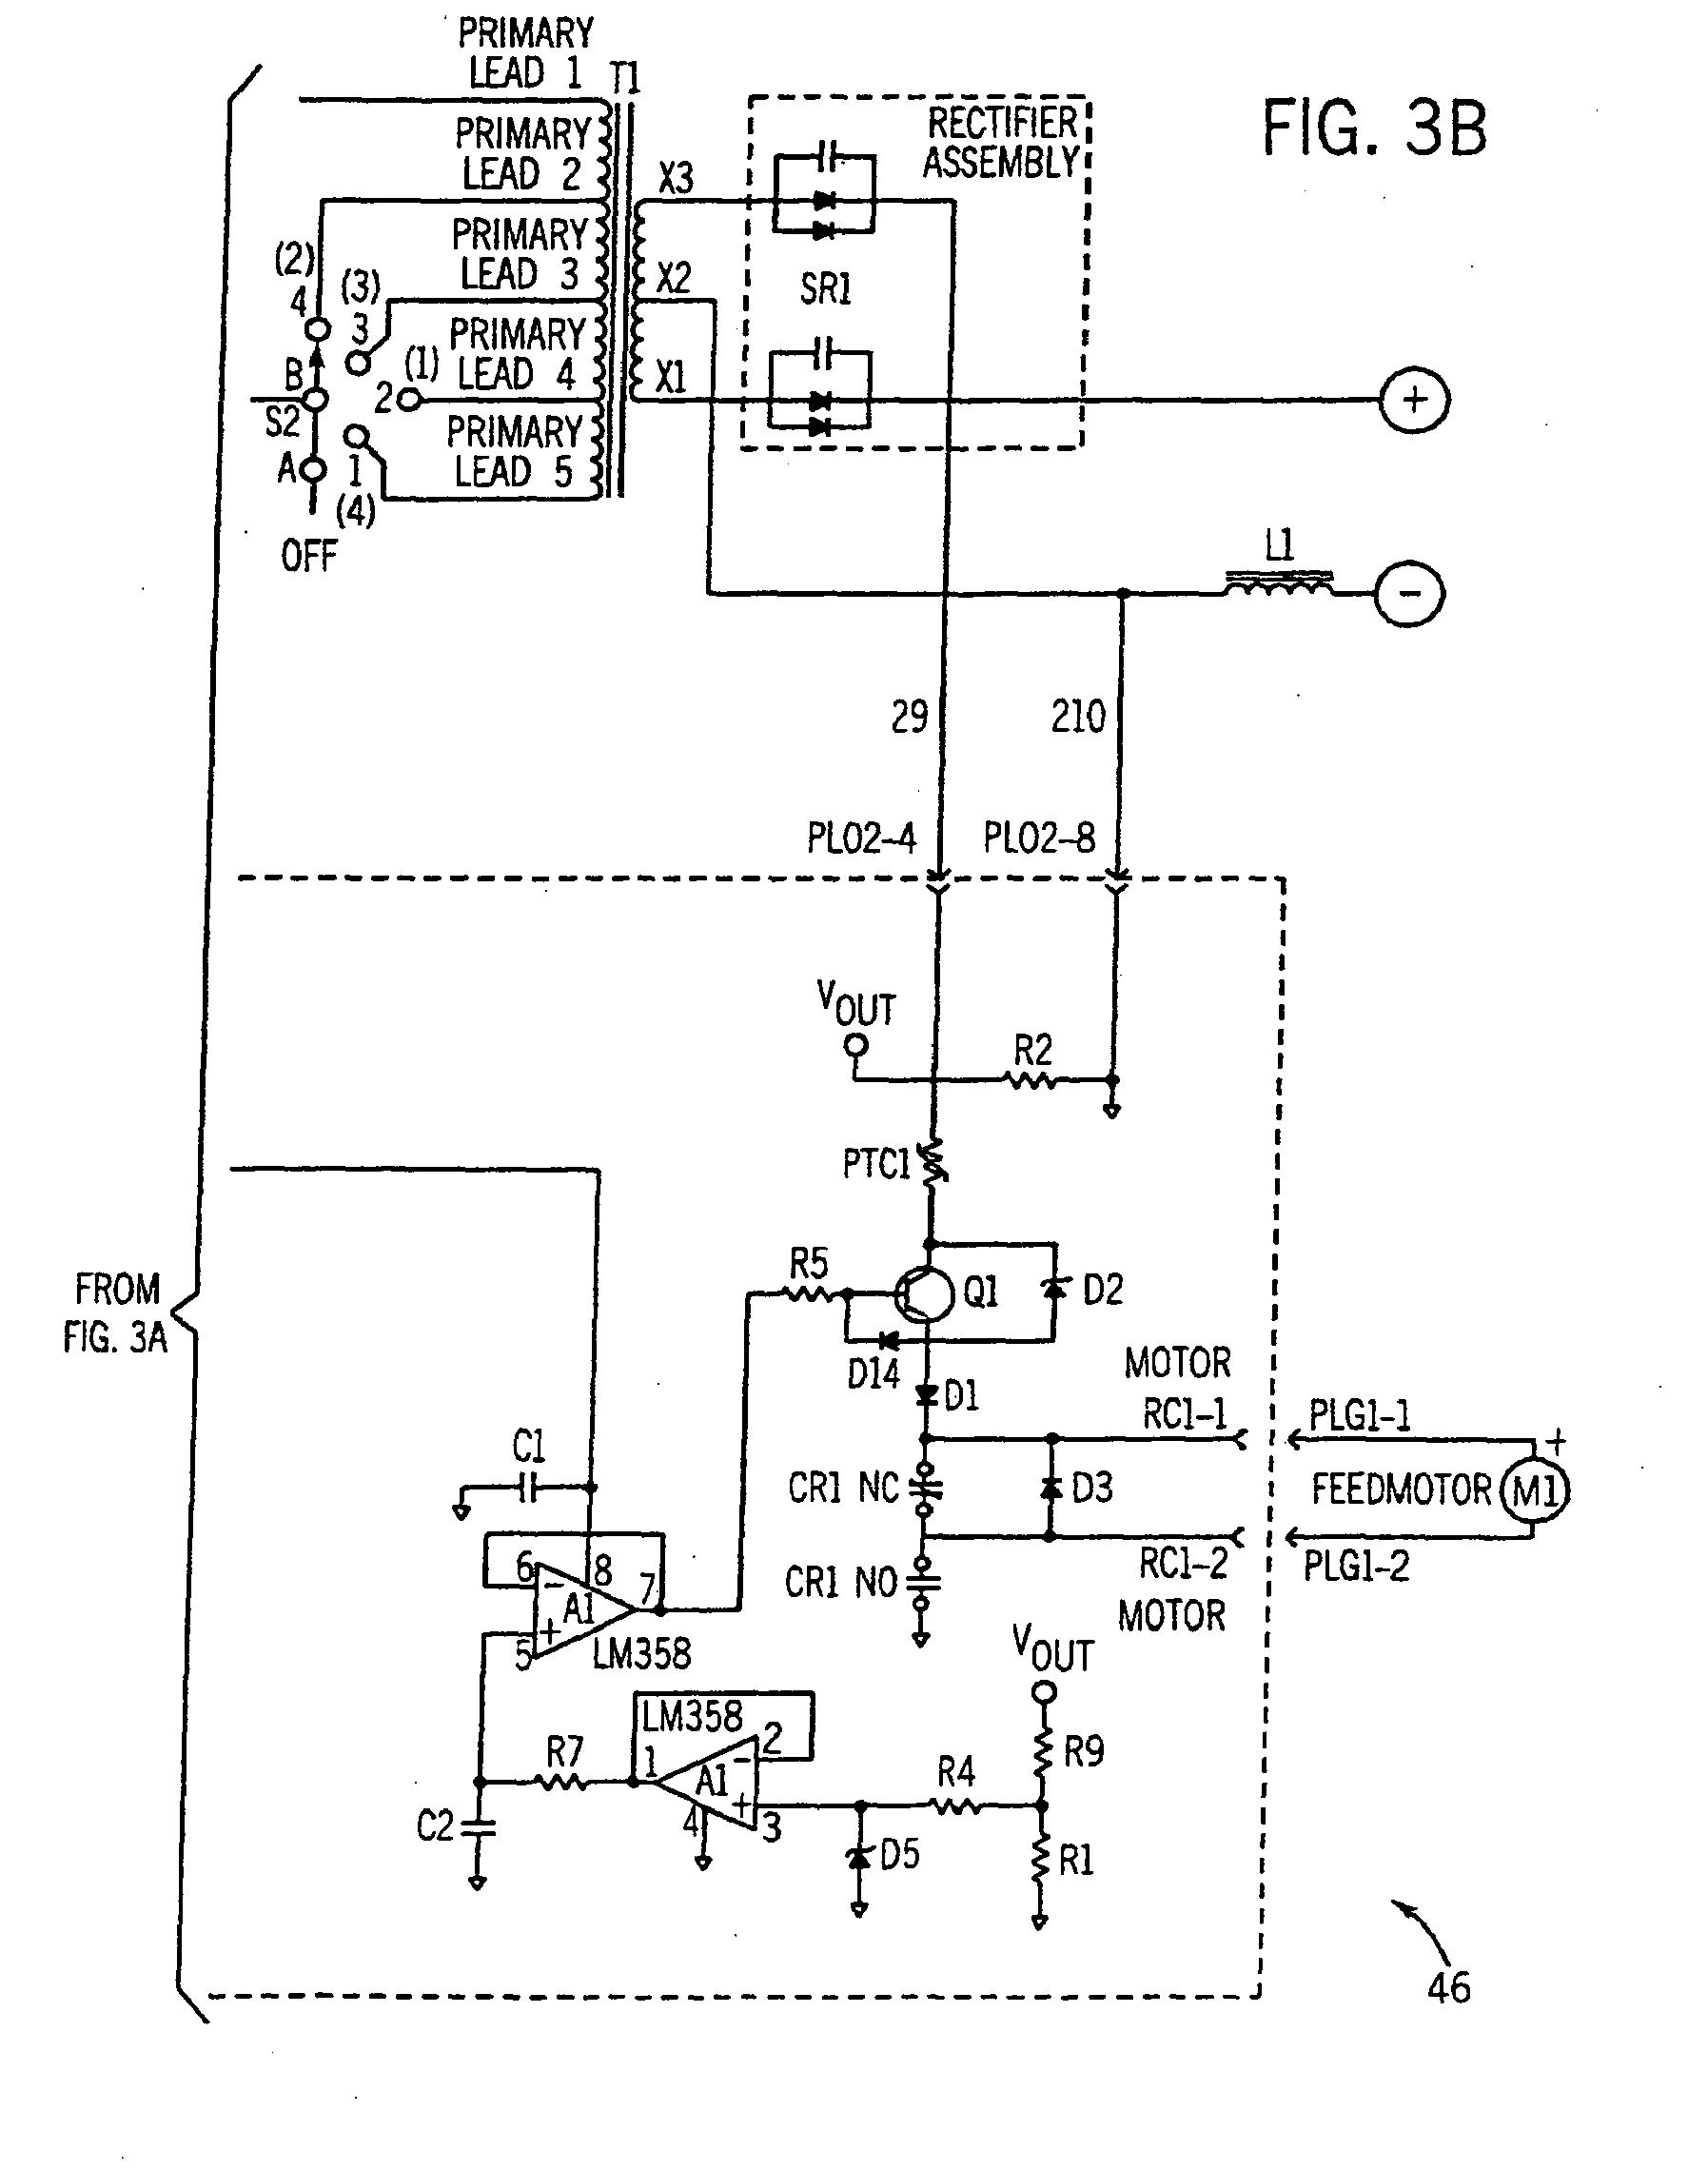 Ya205 Mig Welder Wiring Diagram Trusted Schematics Parts Century 130 Wire Feed Model Sa200